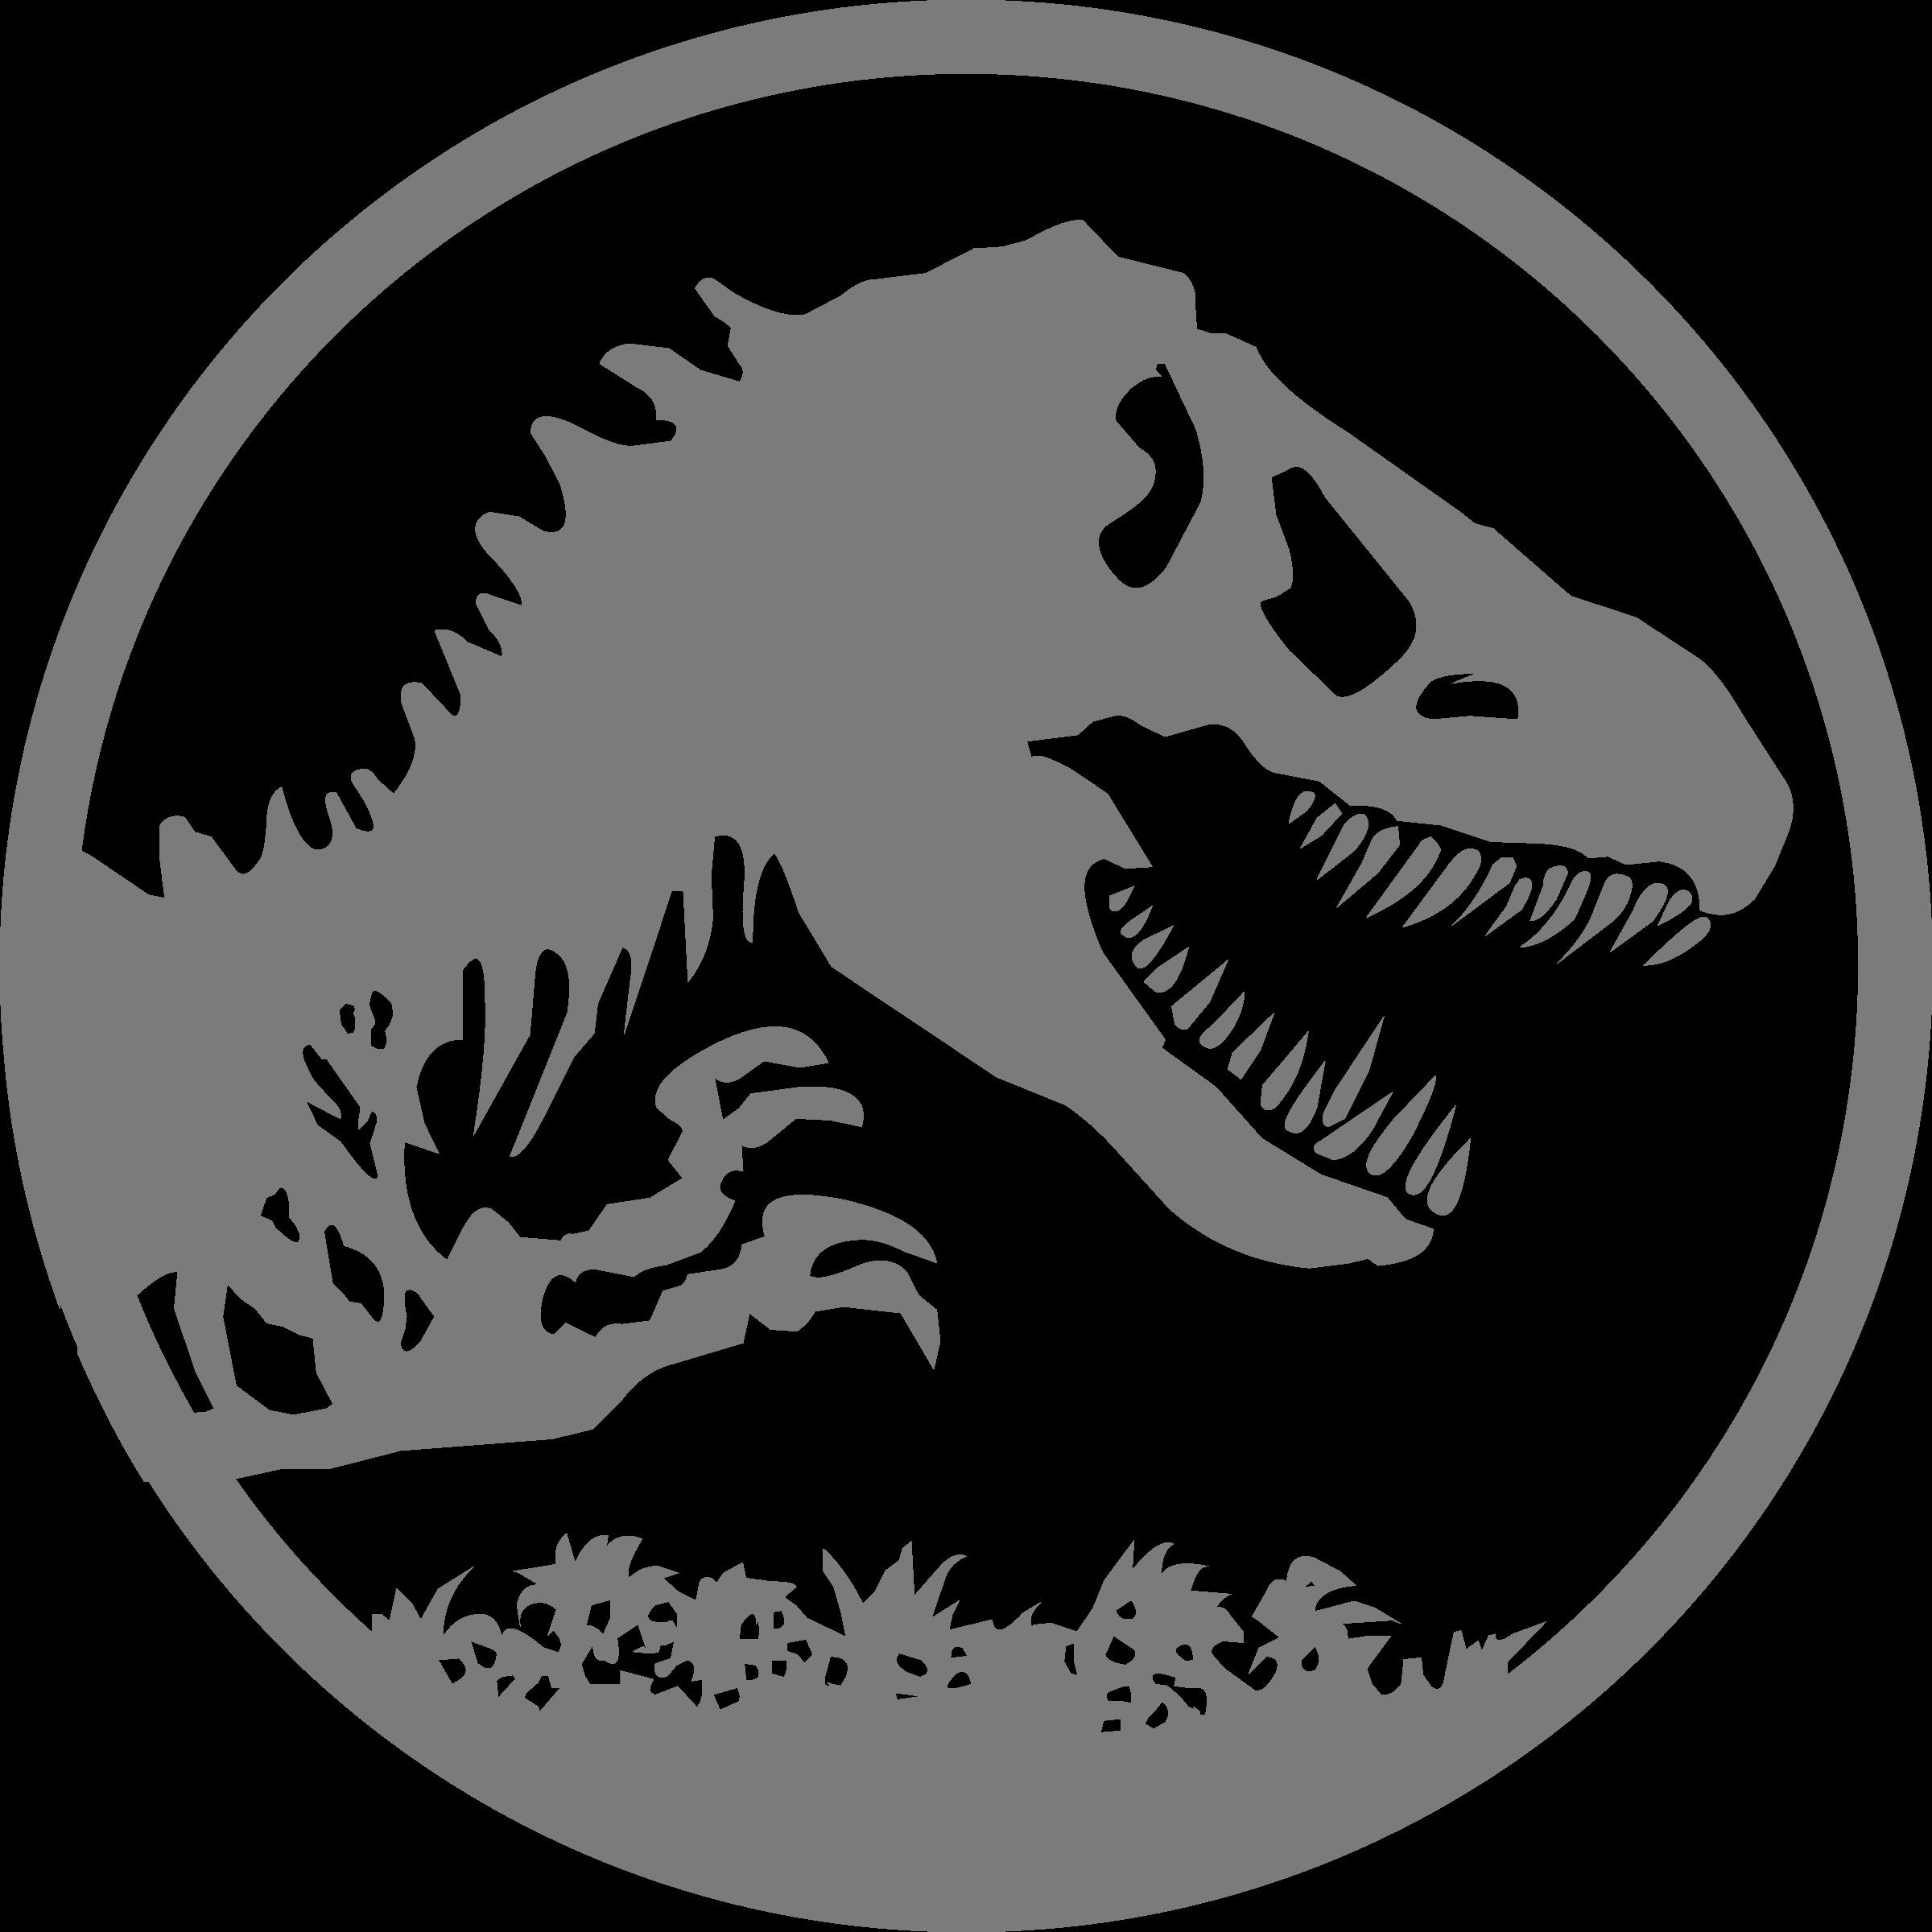 jurassic world logo png transparent   svg vector freebie jaguar logo vector free jaguar new logo vector